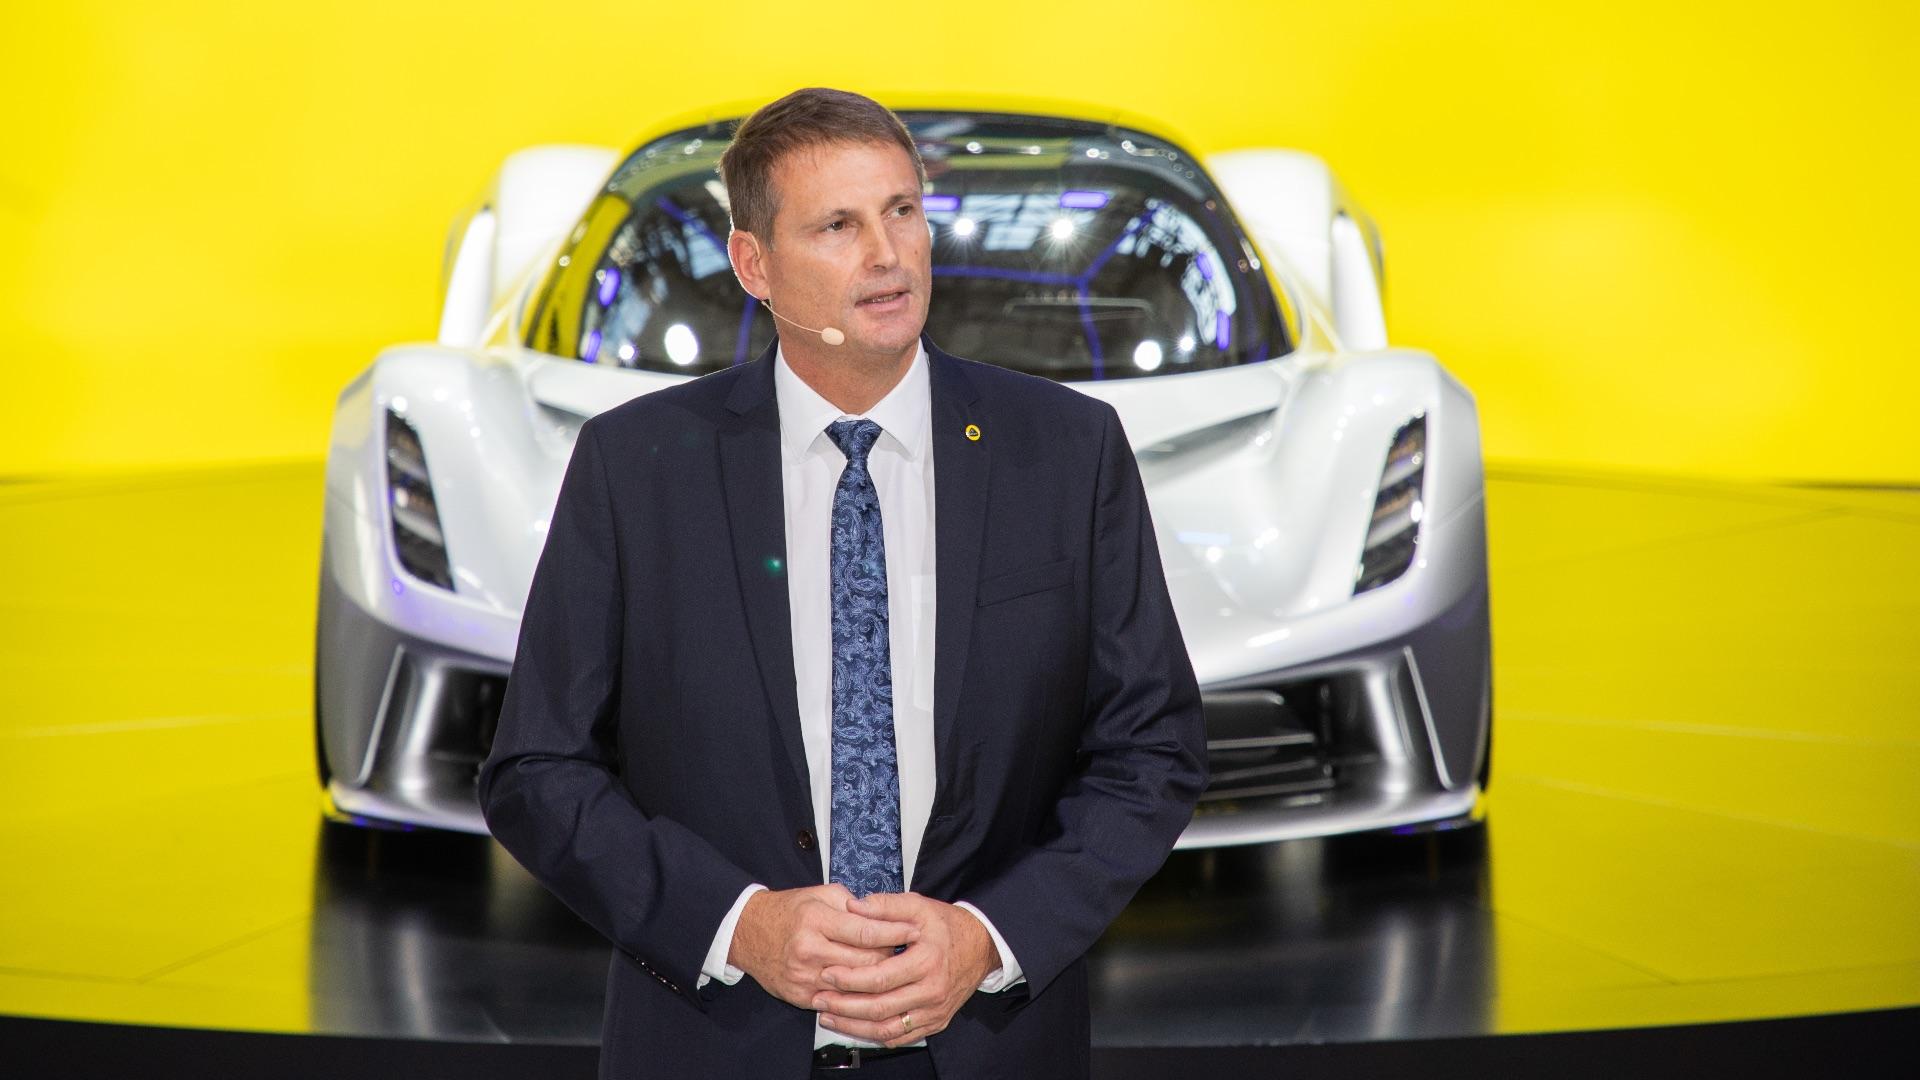 https://www.motoringresearch.com/wp-content/uploads/2019/12/Guangzhou-Auto-Show-CEO-Lotus-Cars-Phil-Popham.jpg